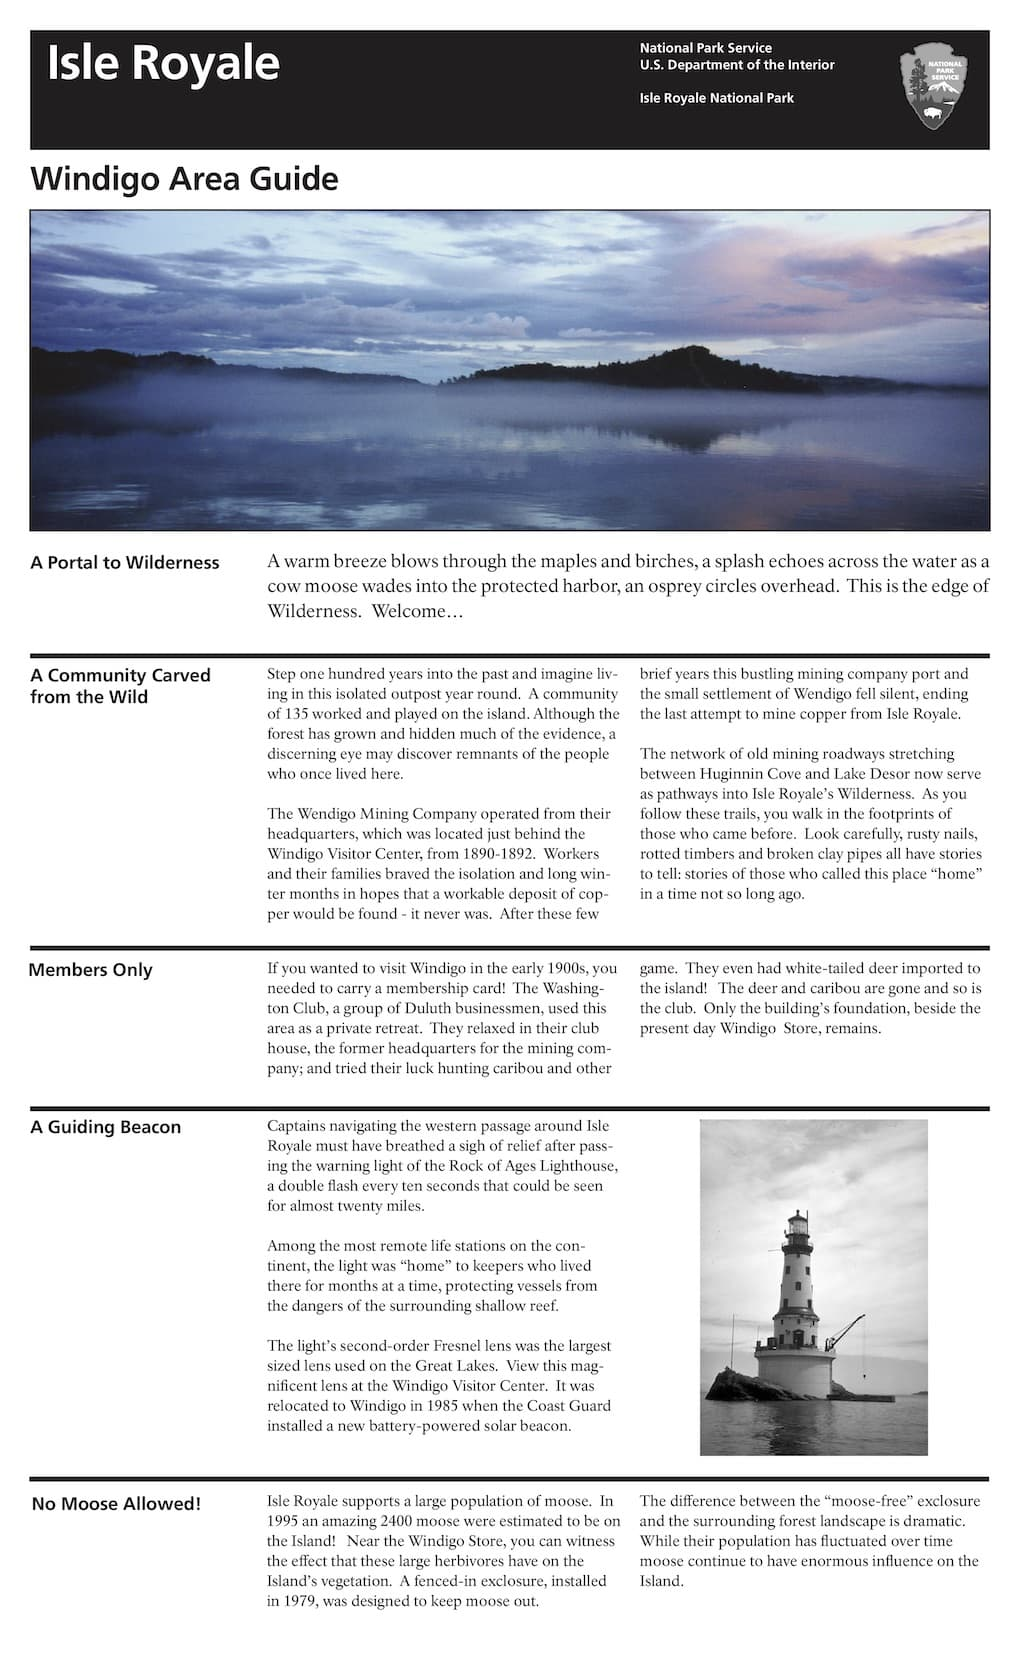 Preview image for Windigo Area Guide resource